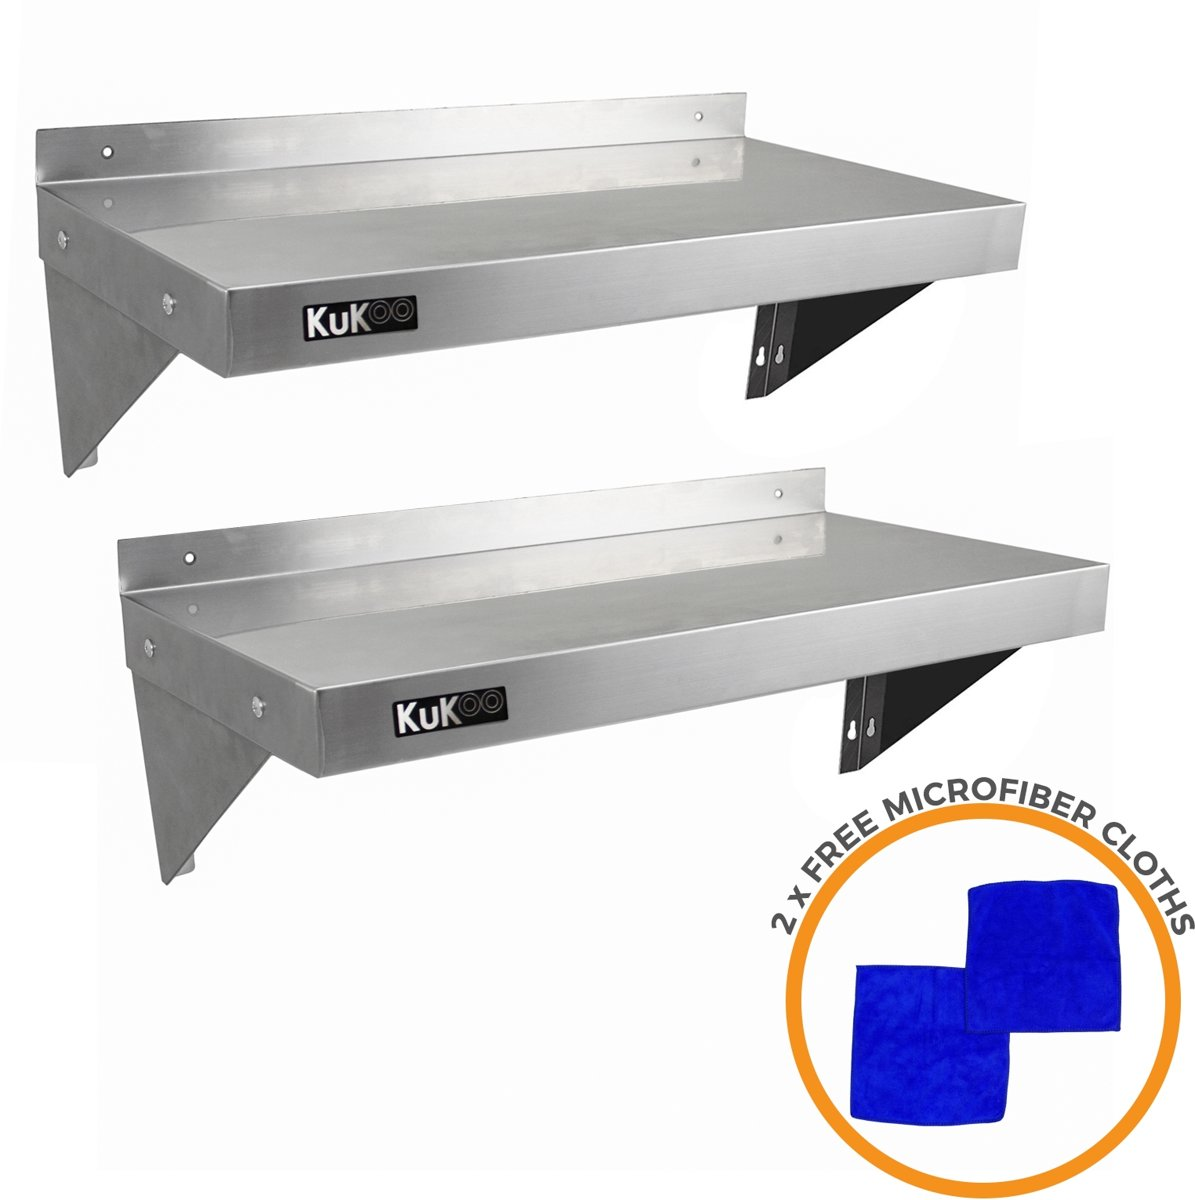 KuKoo ? Wandschap - RVS Keuken plank ? Roestvast wandplank set 2x ? 90cm x 30cm